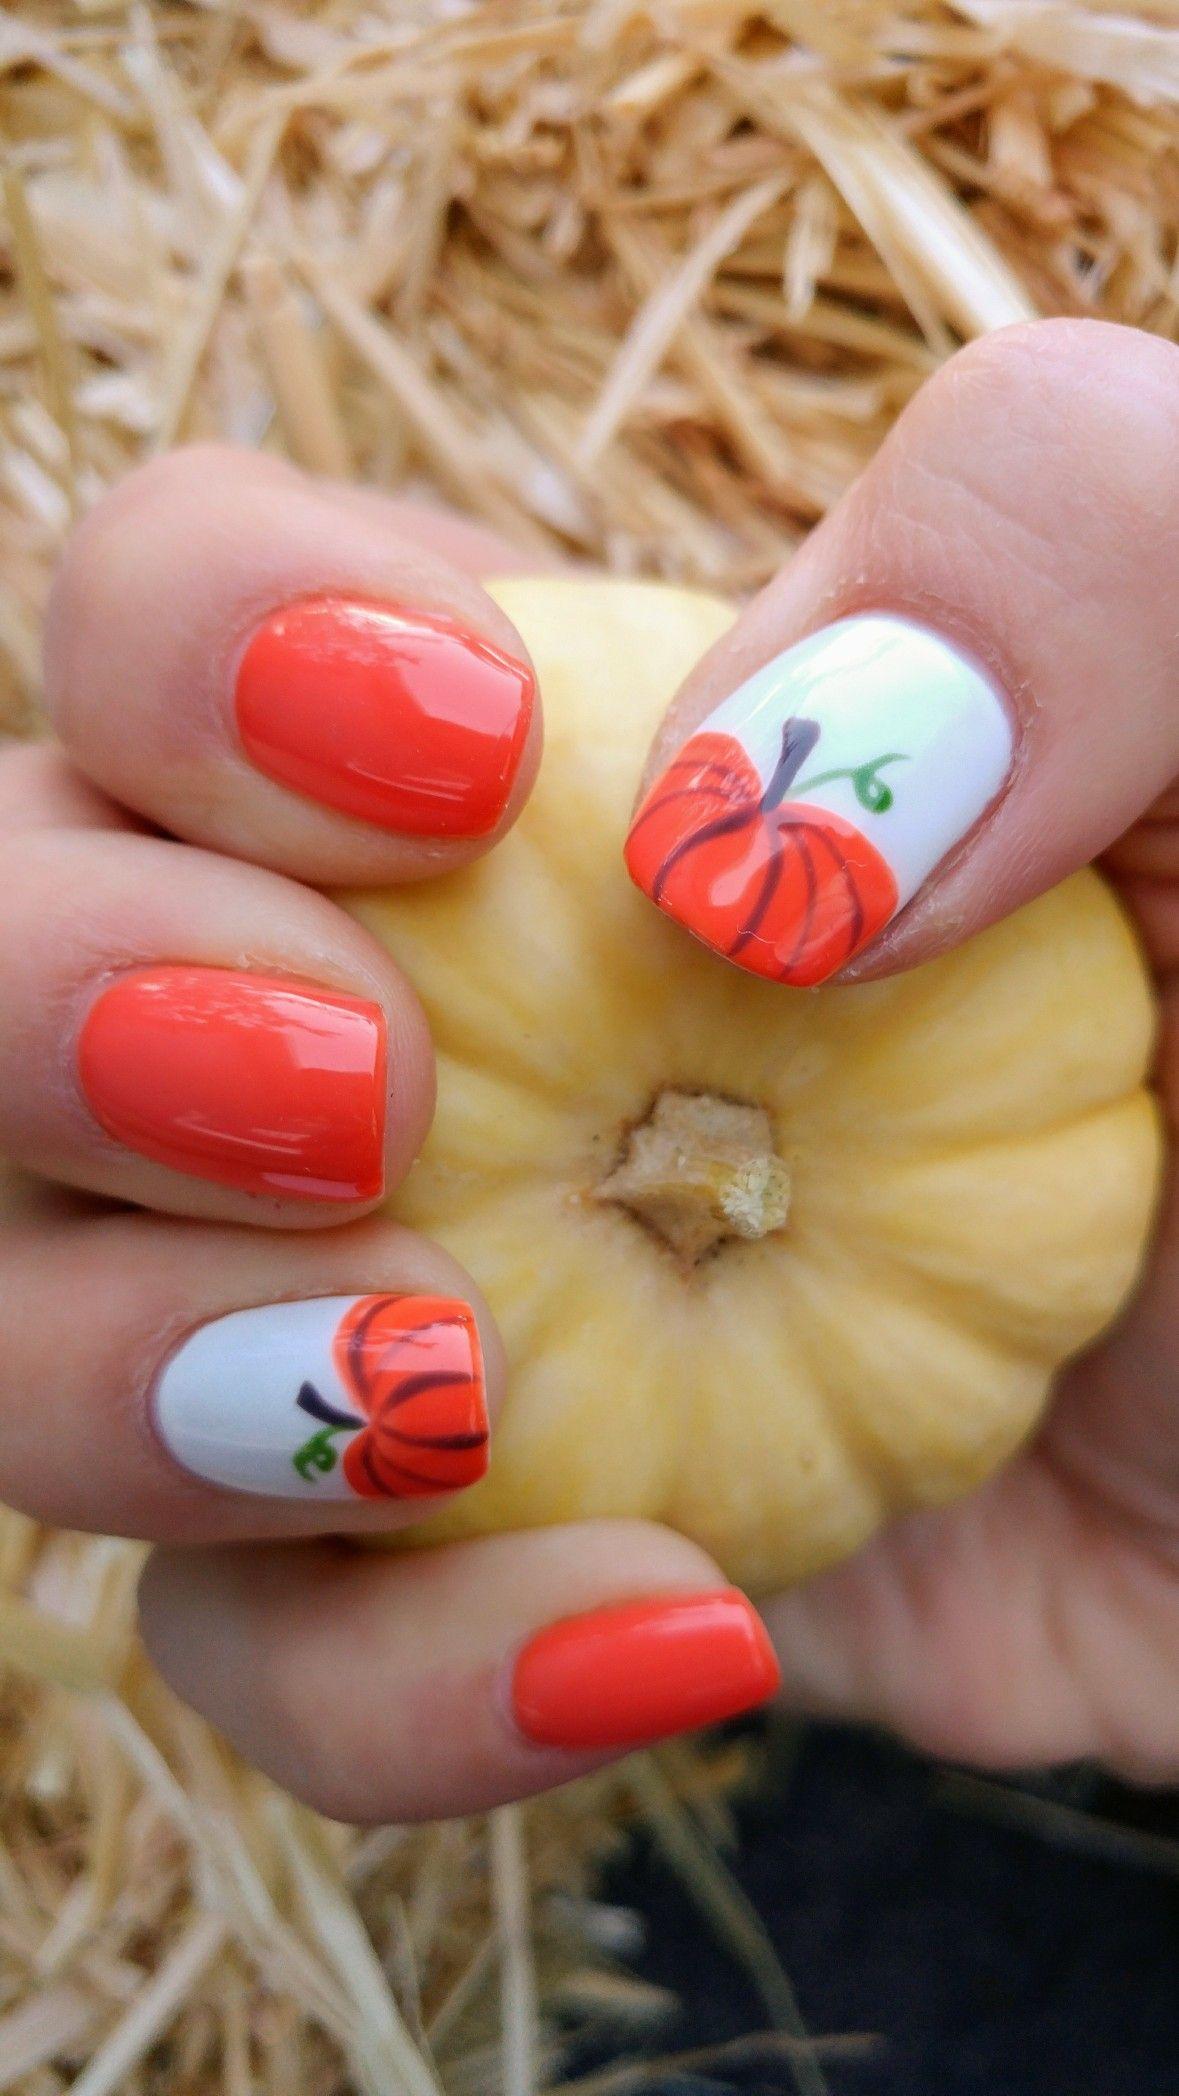 My October Nails Ascensionnailboutique Lexirocks Nail Ideas